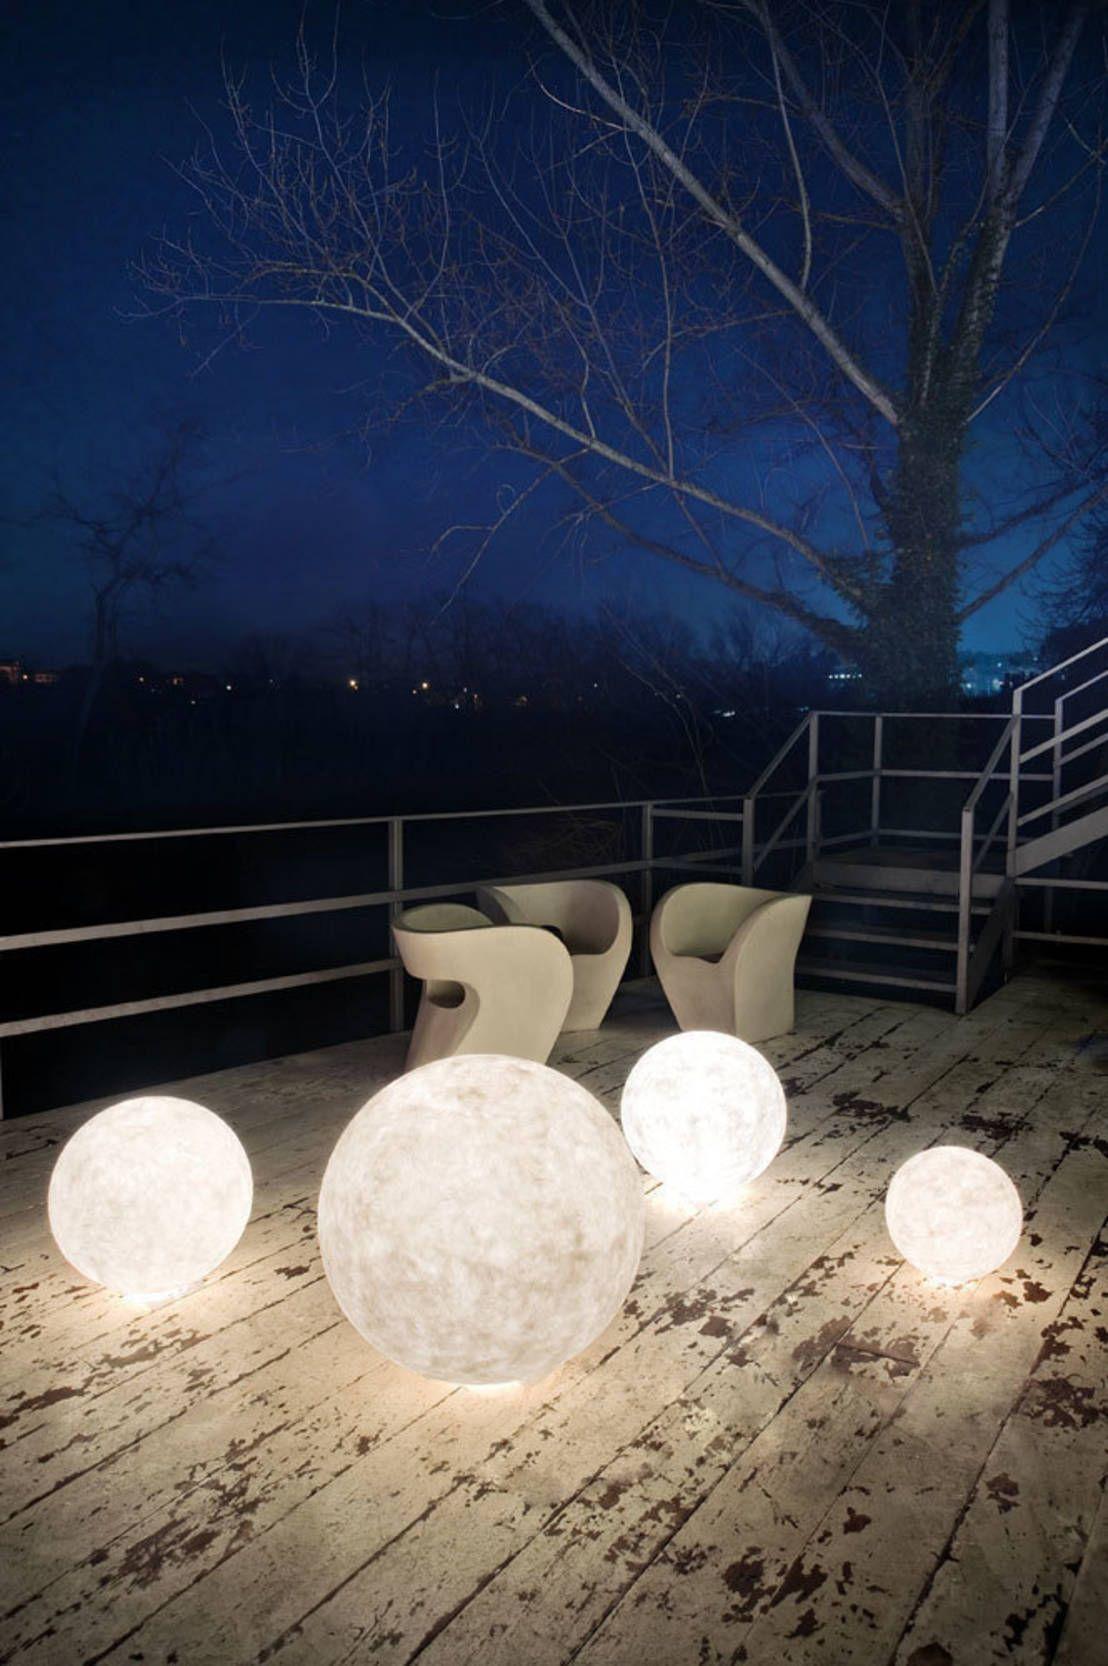 Outdoor Floor Lamps To Use In A Deck Or Patio Plancha Exterieur Eclairage De Jardin Lampes De Sol Modernes